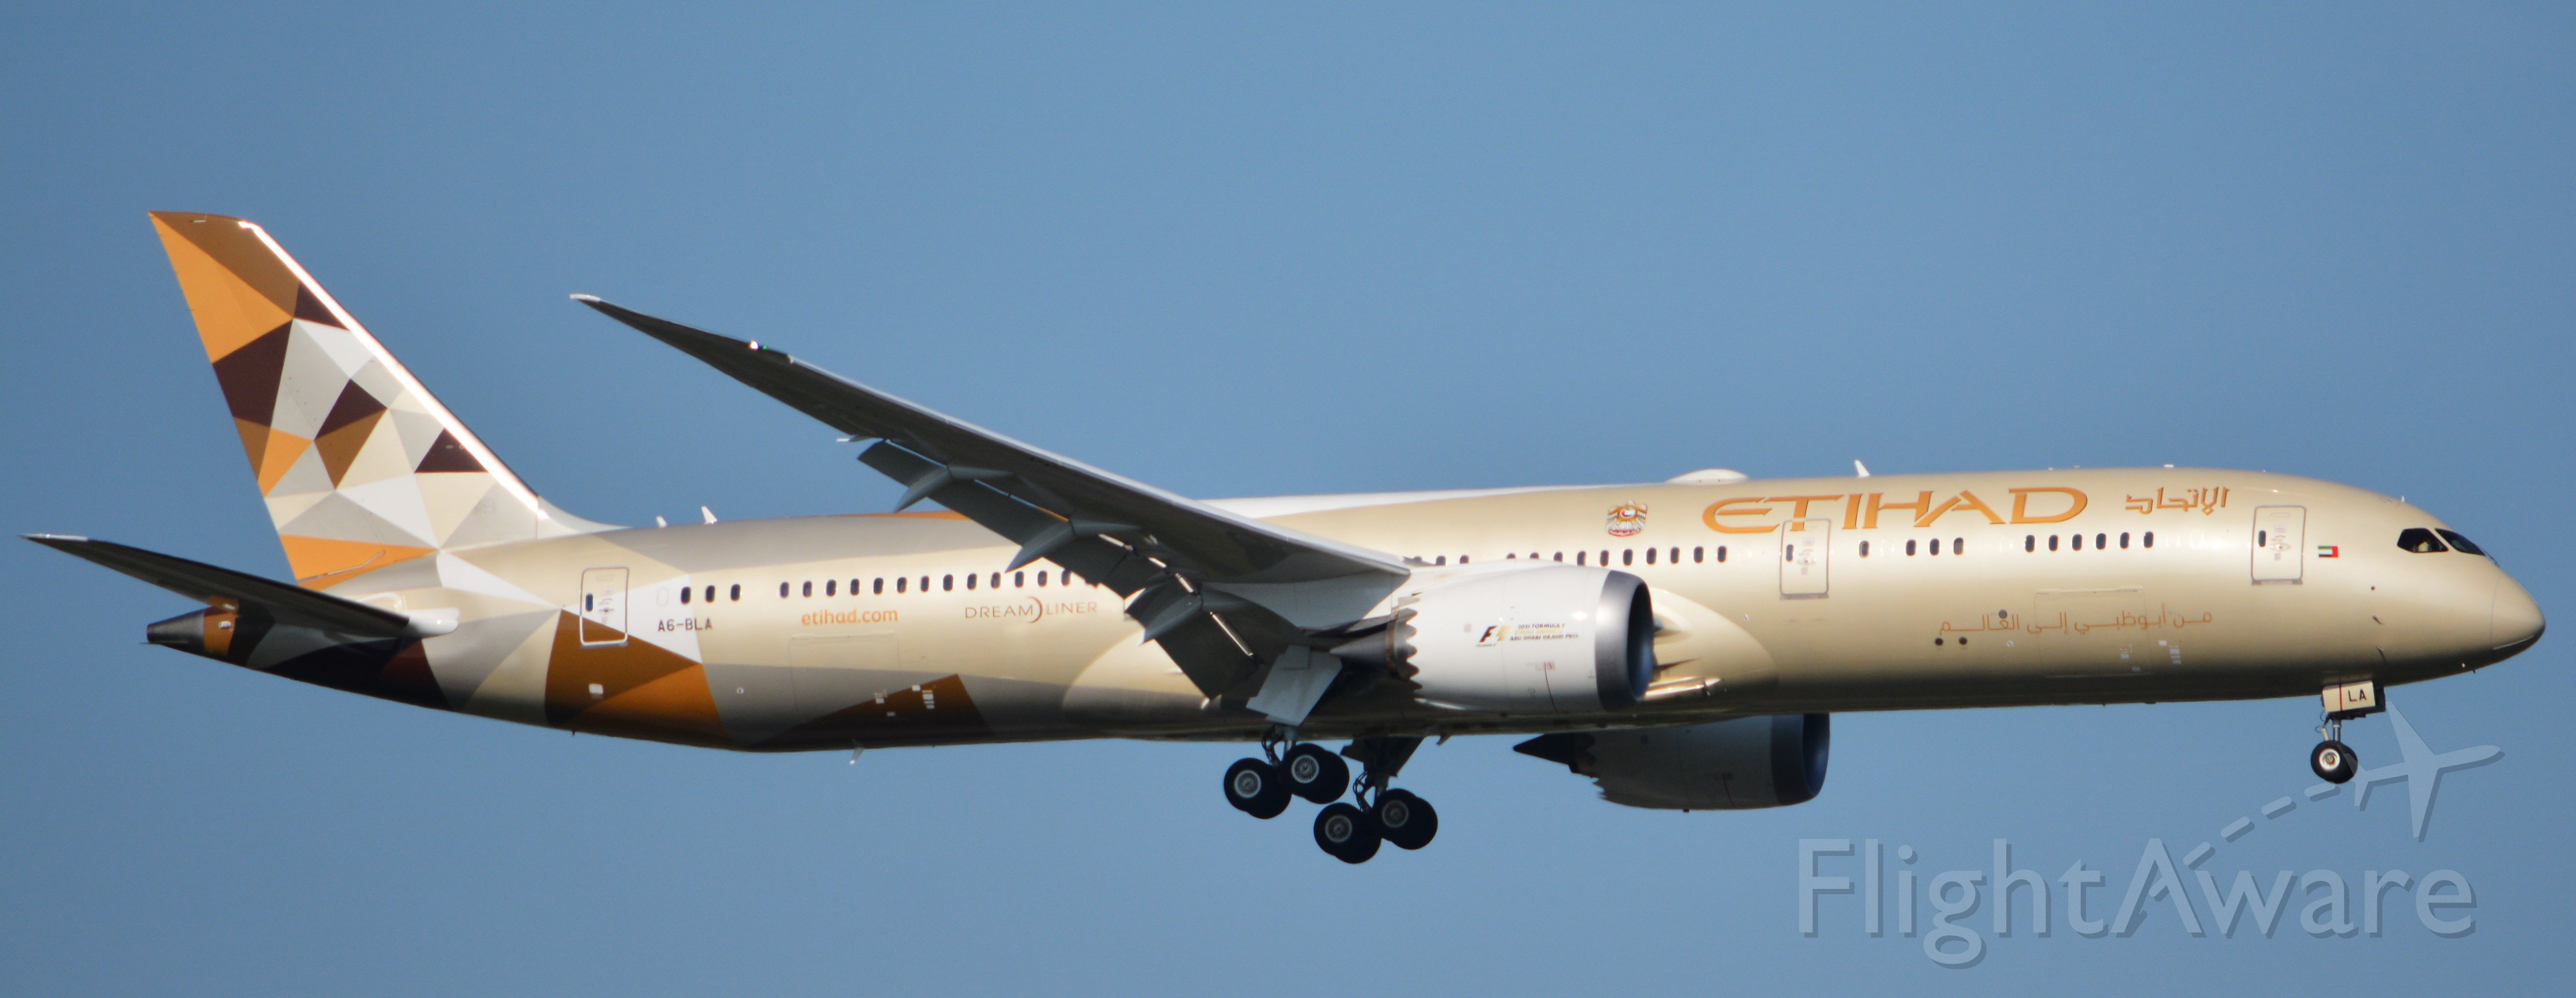 Boeing 787-9 Dreamliner (A6-BLA) - Final to RWY 19C